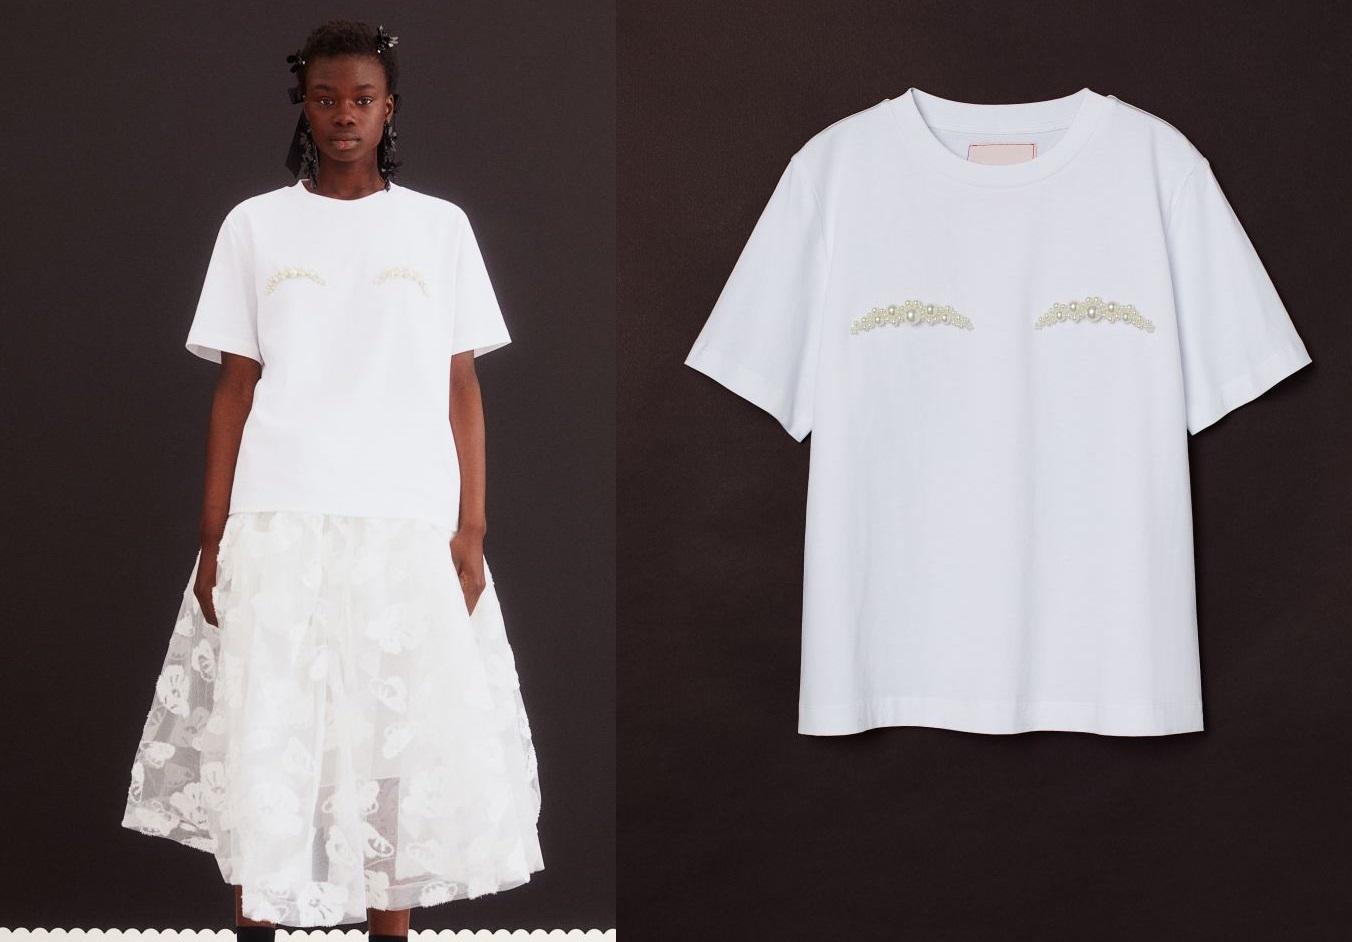 Simone Rocha x H&m t-shirt